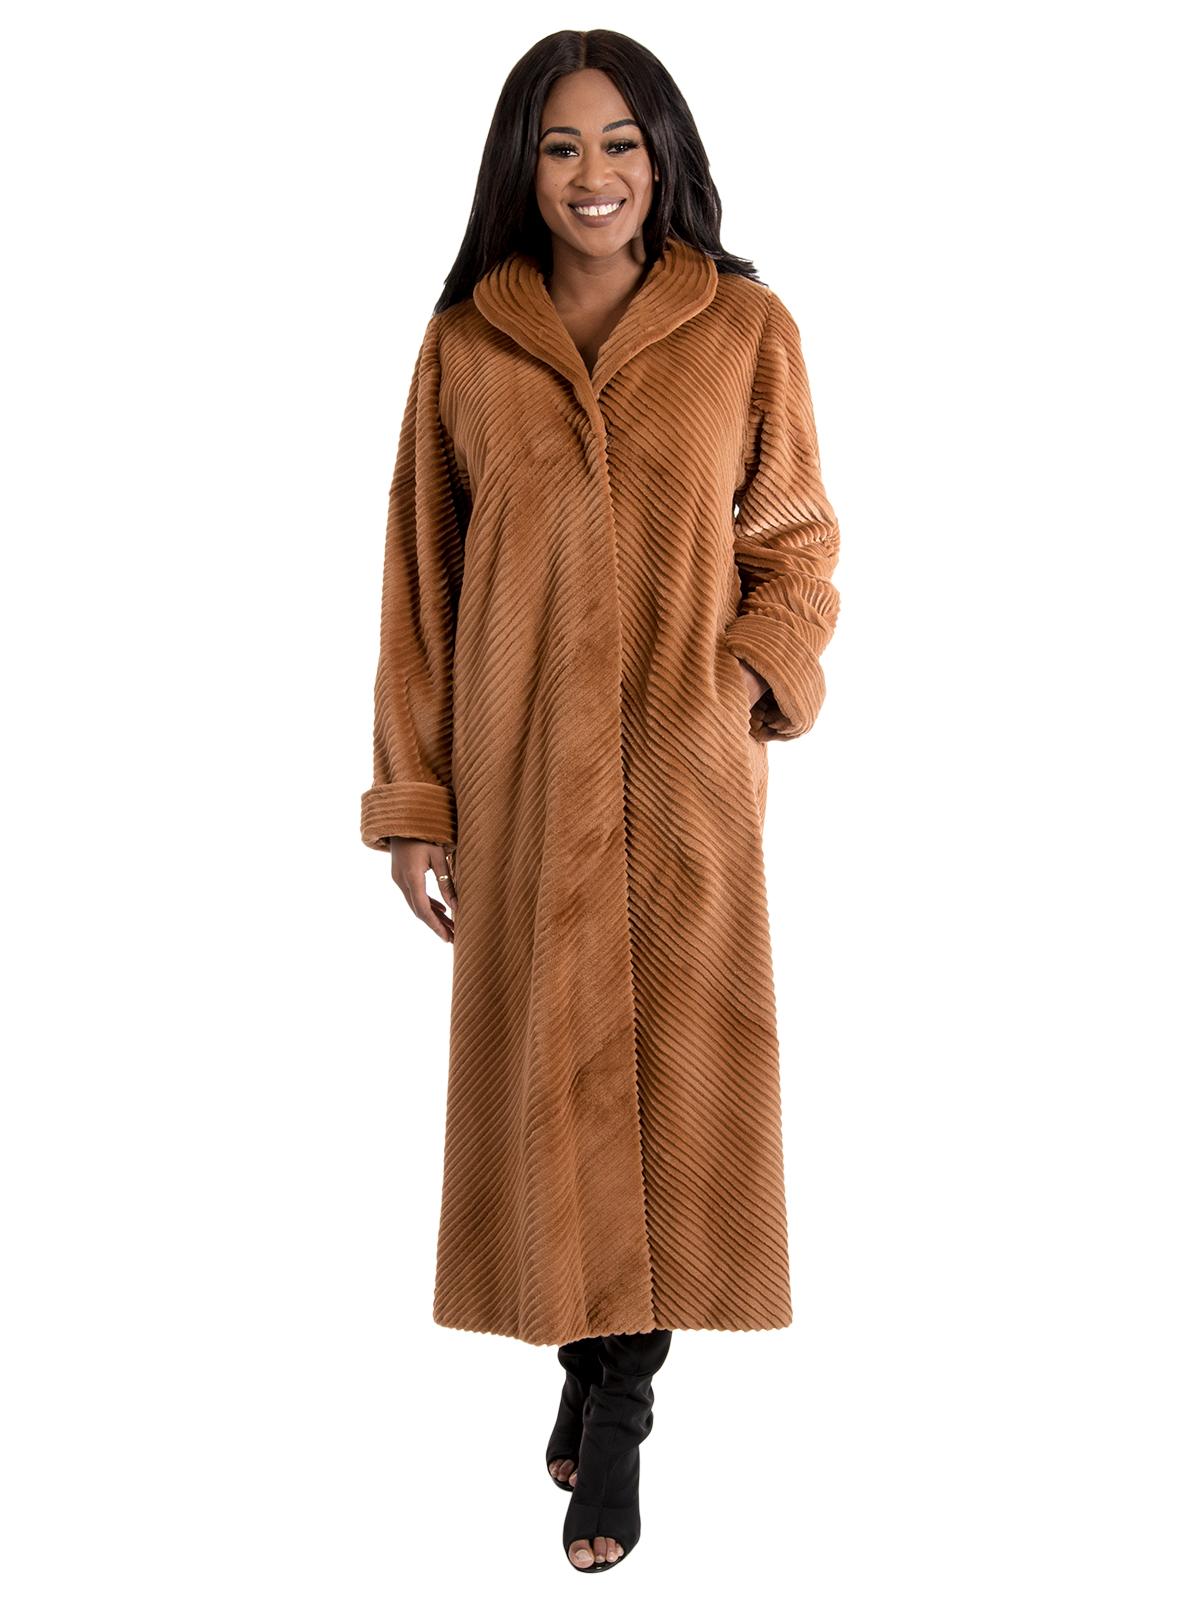 Women's Sheared Mink Fur Coat